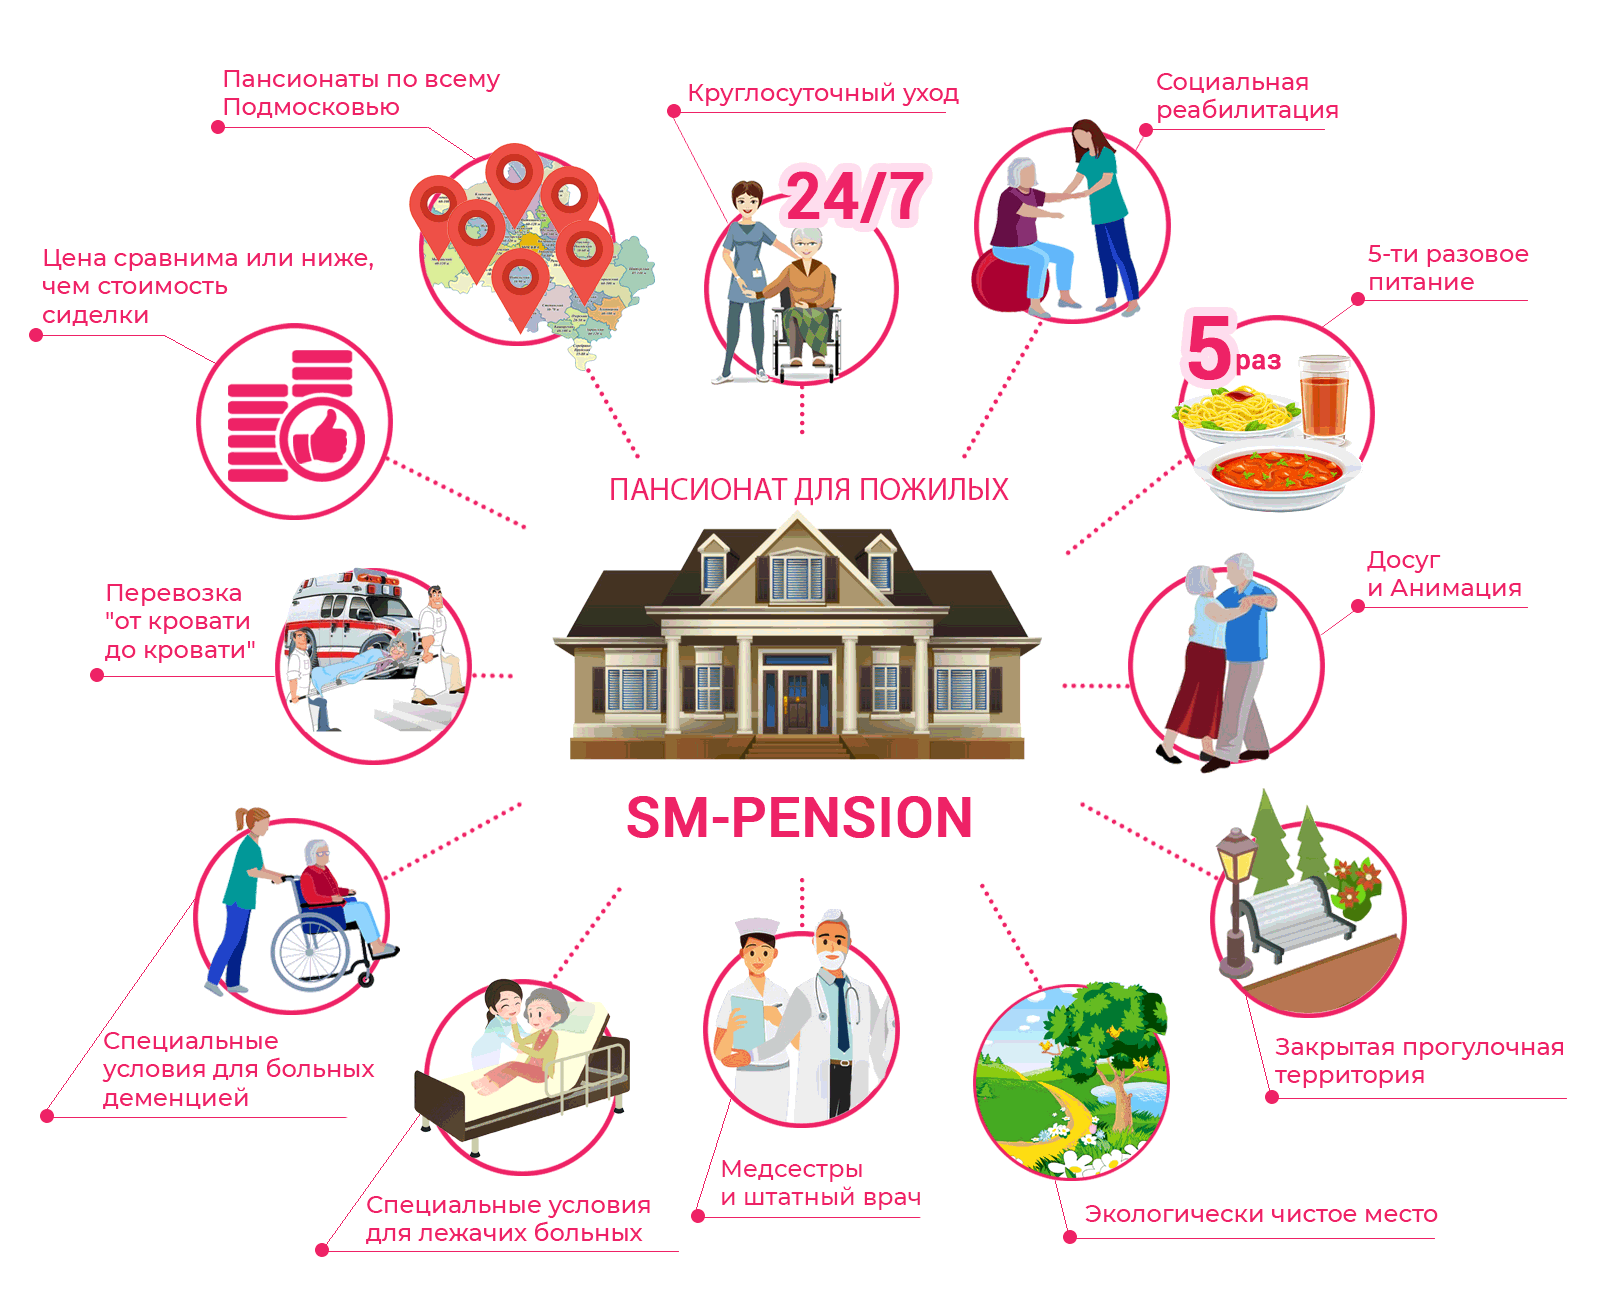 Преимущества SM-pension